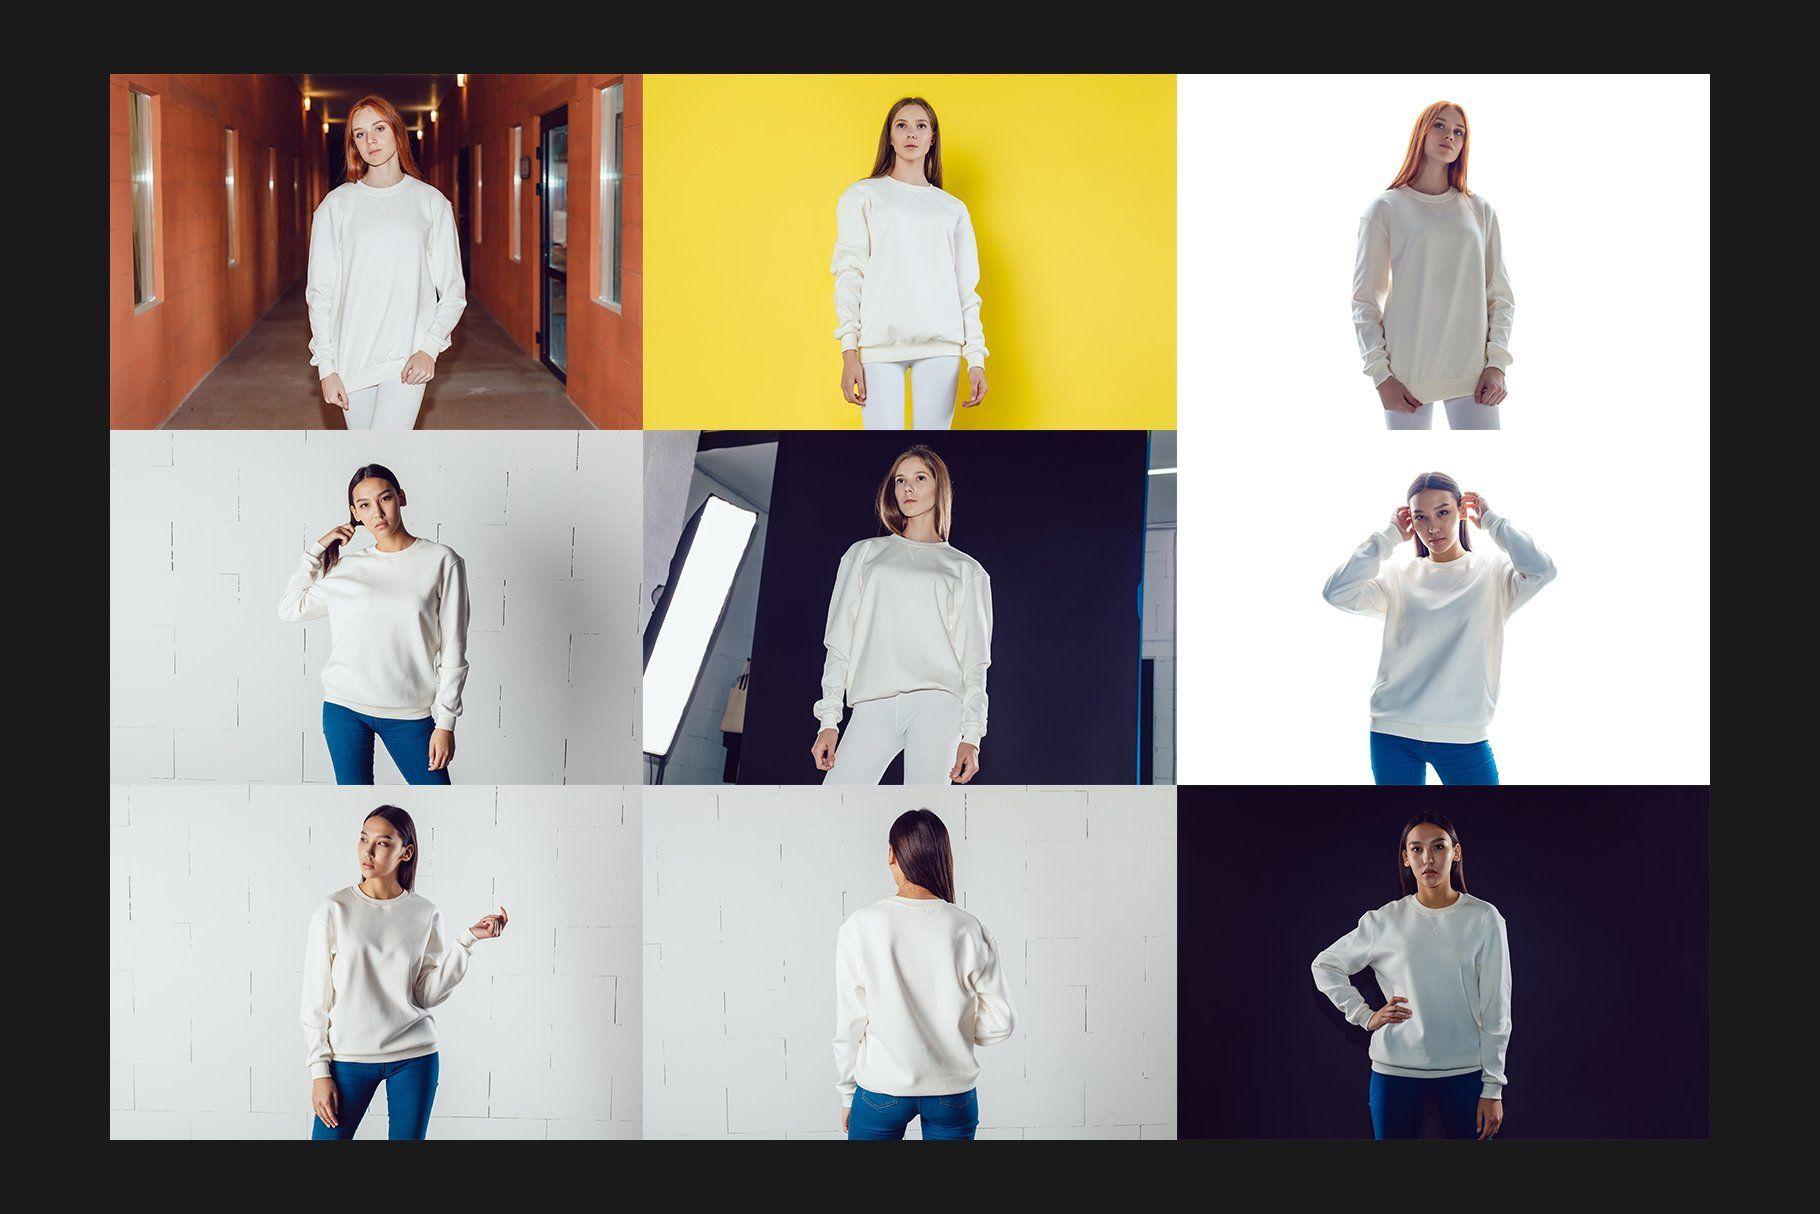 Download 32 Sweatshirt Mock Up Set Sweatshirts Kids Tshirts Sport Outfits